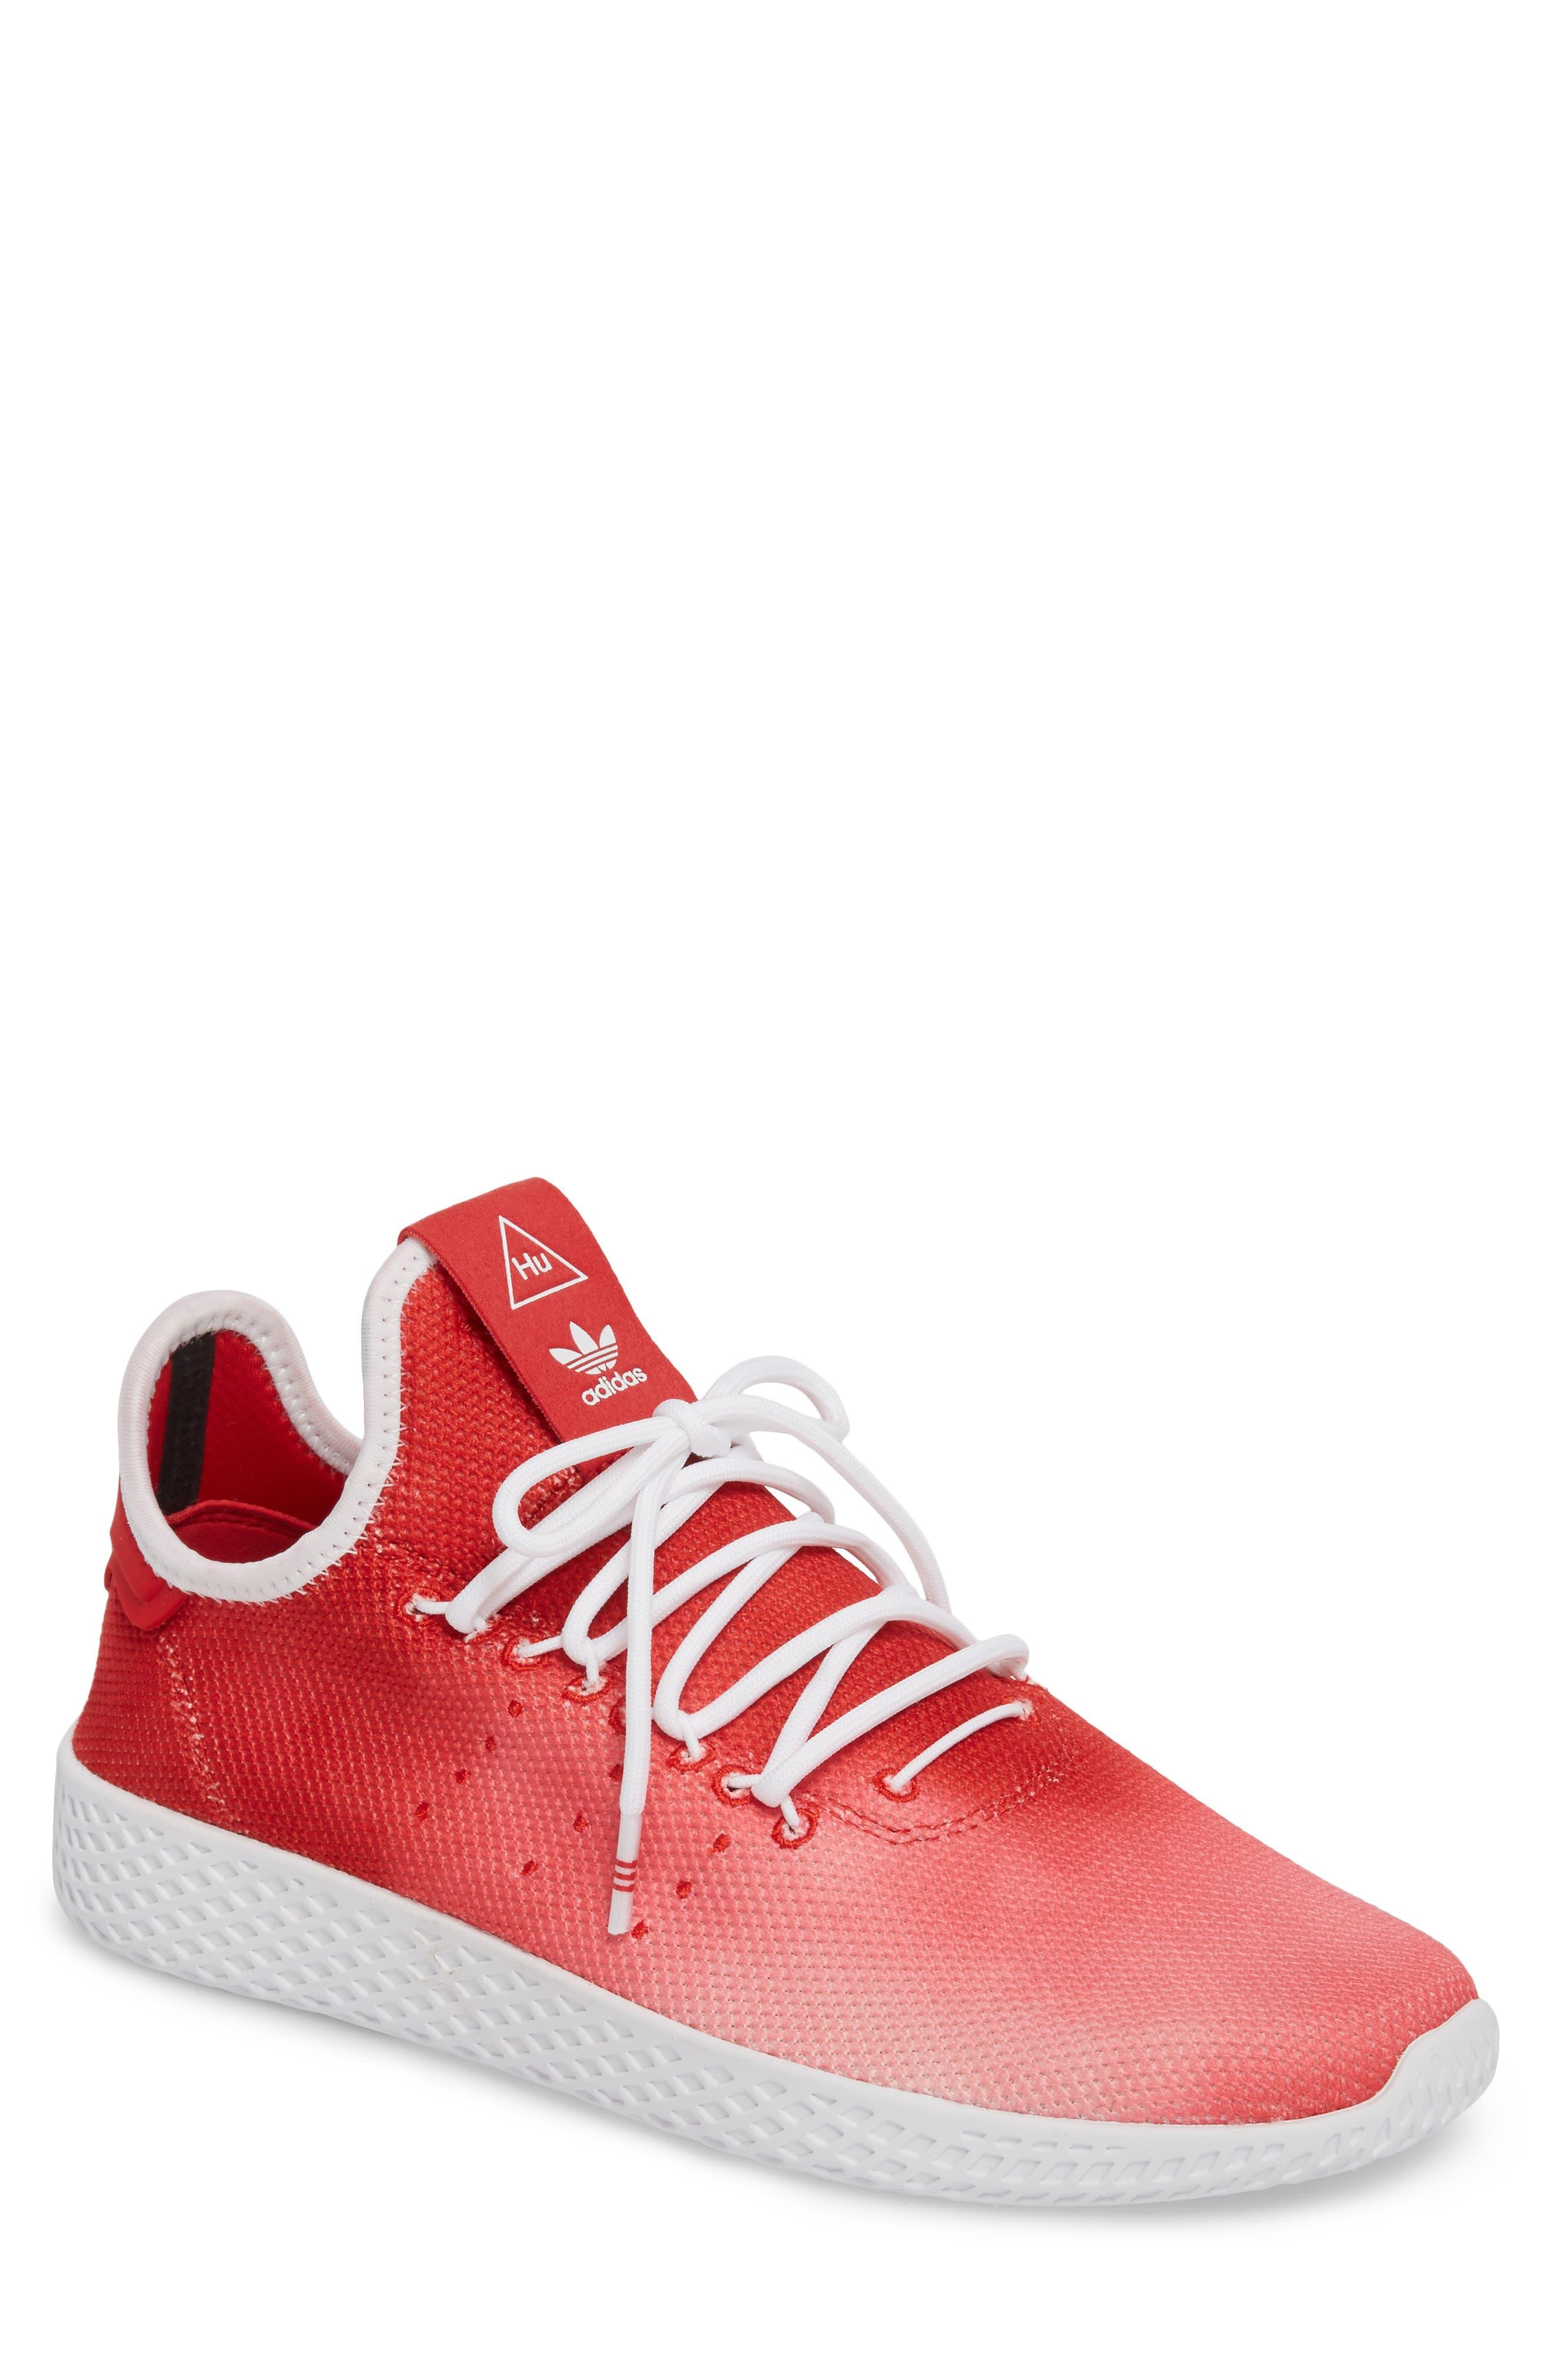 adidas Pharrell Williams Tennis Hu Sneaker (Men)